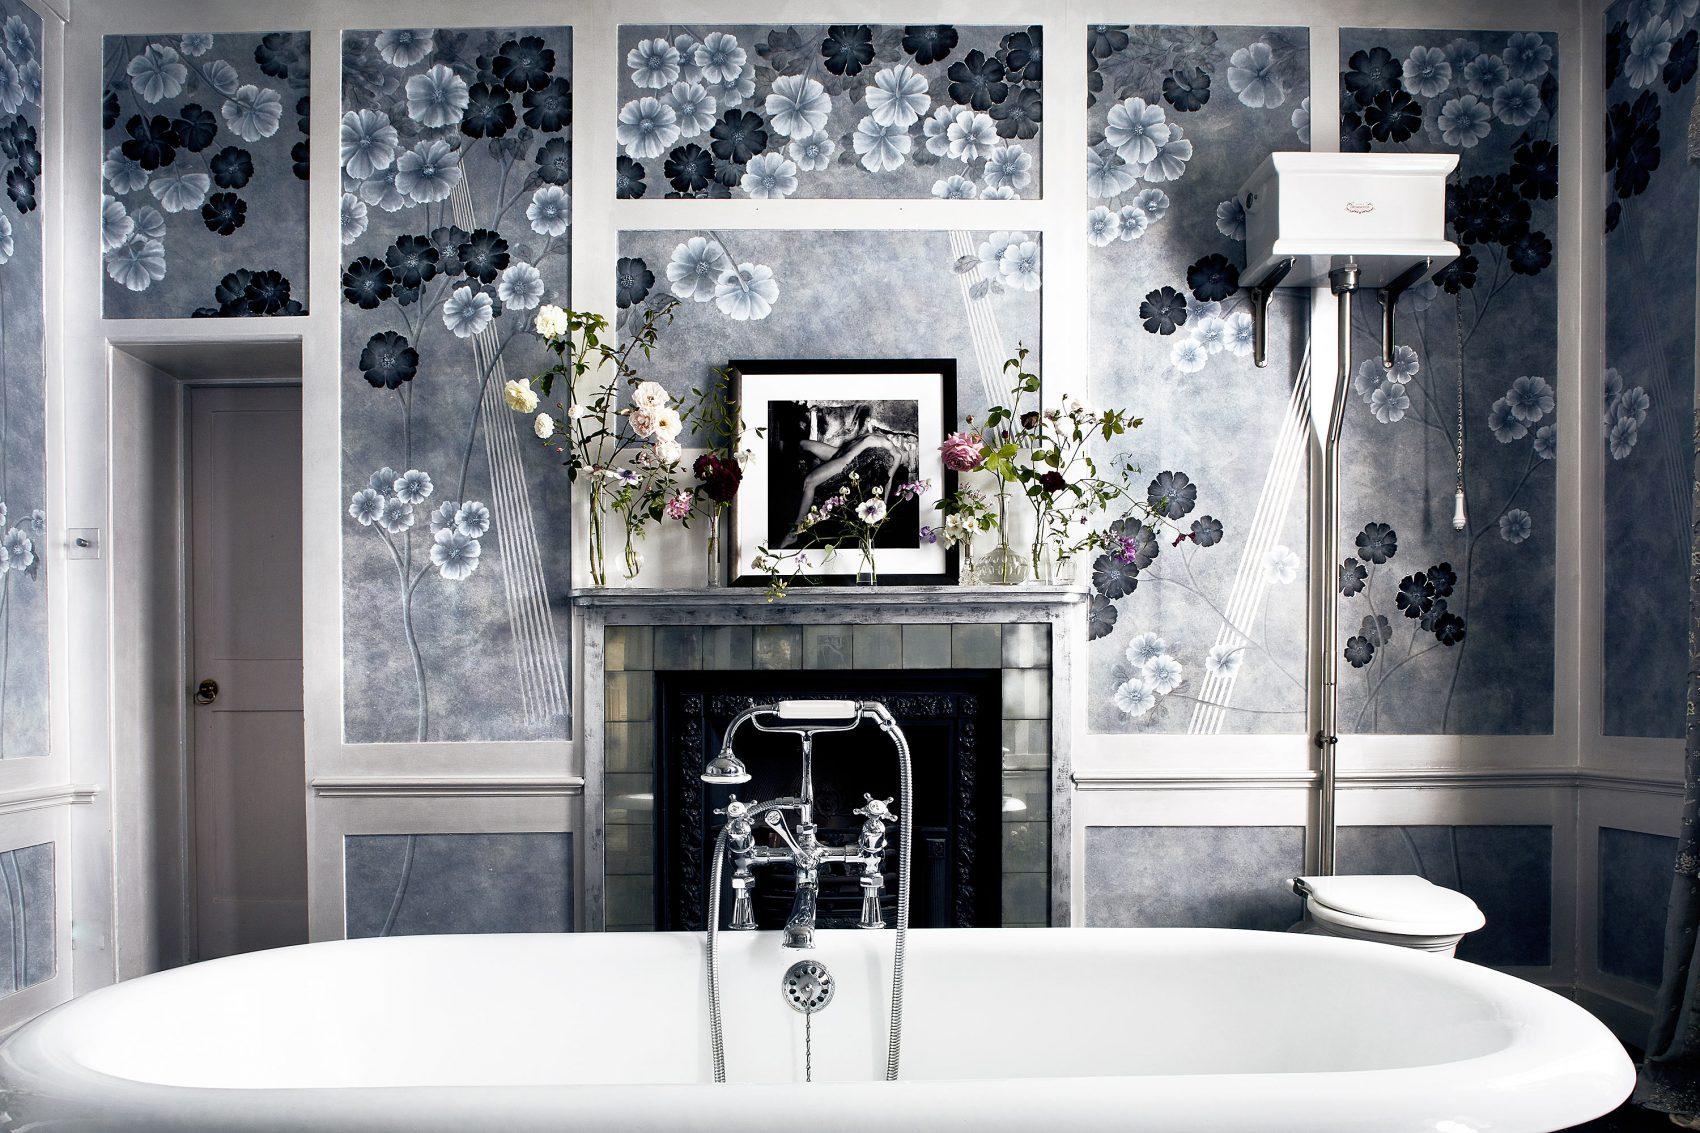 Anemones-in-Light-Dusk-Colourway-Bathroom-Installation.-Photo-by-Simon-Brown-520000-1700x1133.jpg